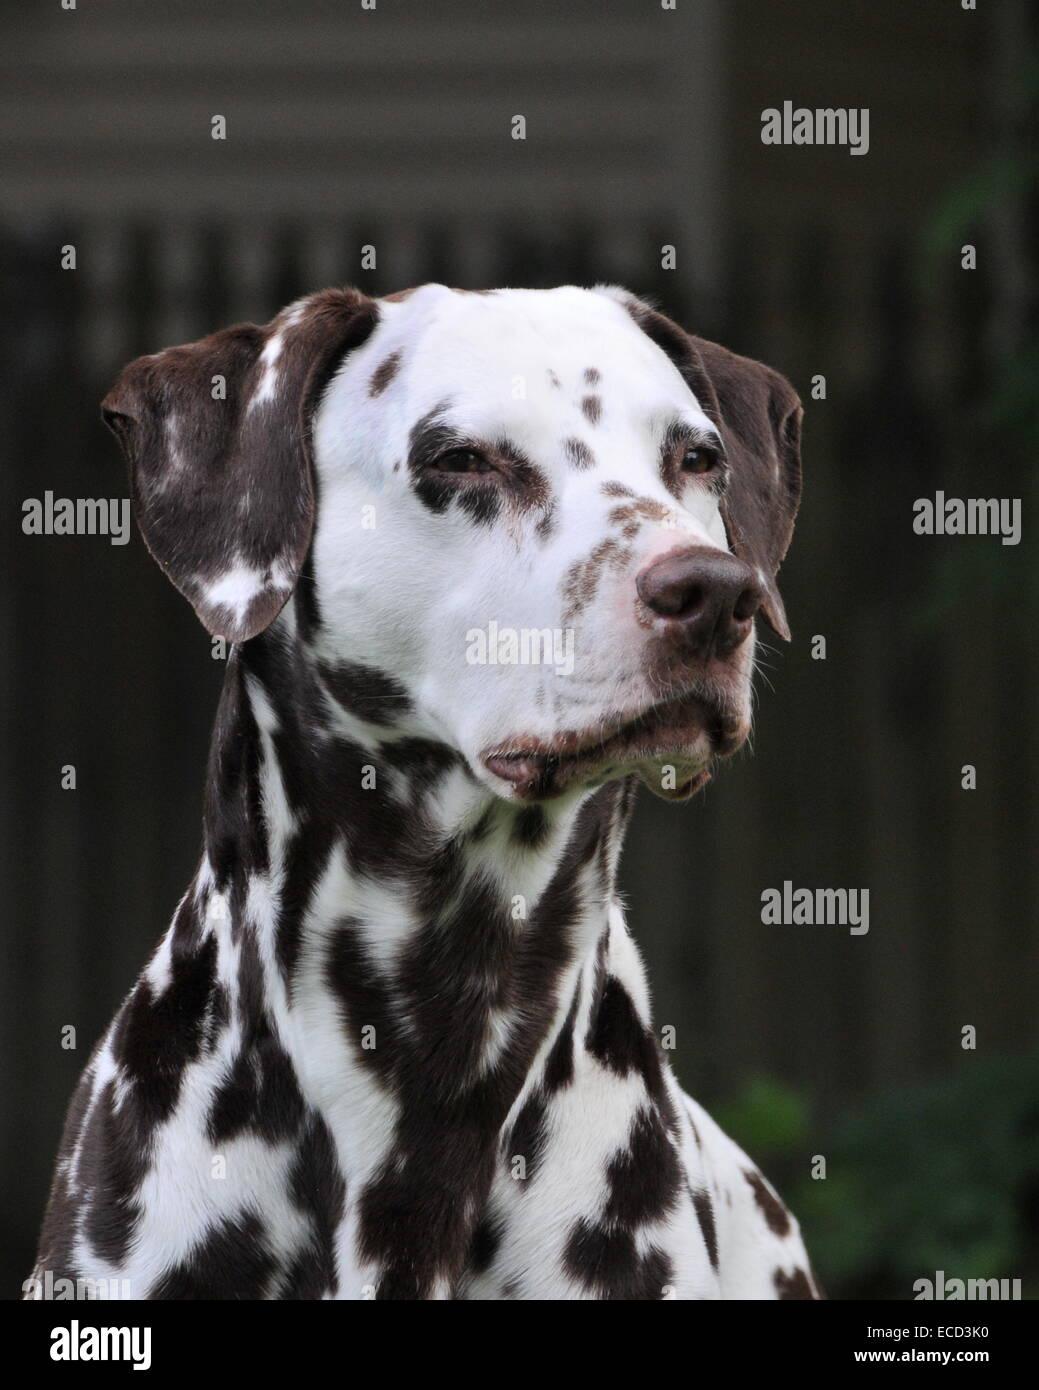 Liver & White spotted Dalmatian head portrait - Stock Image